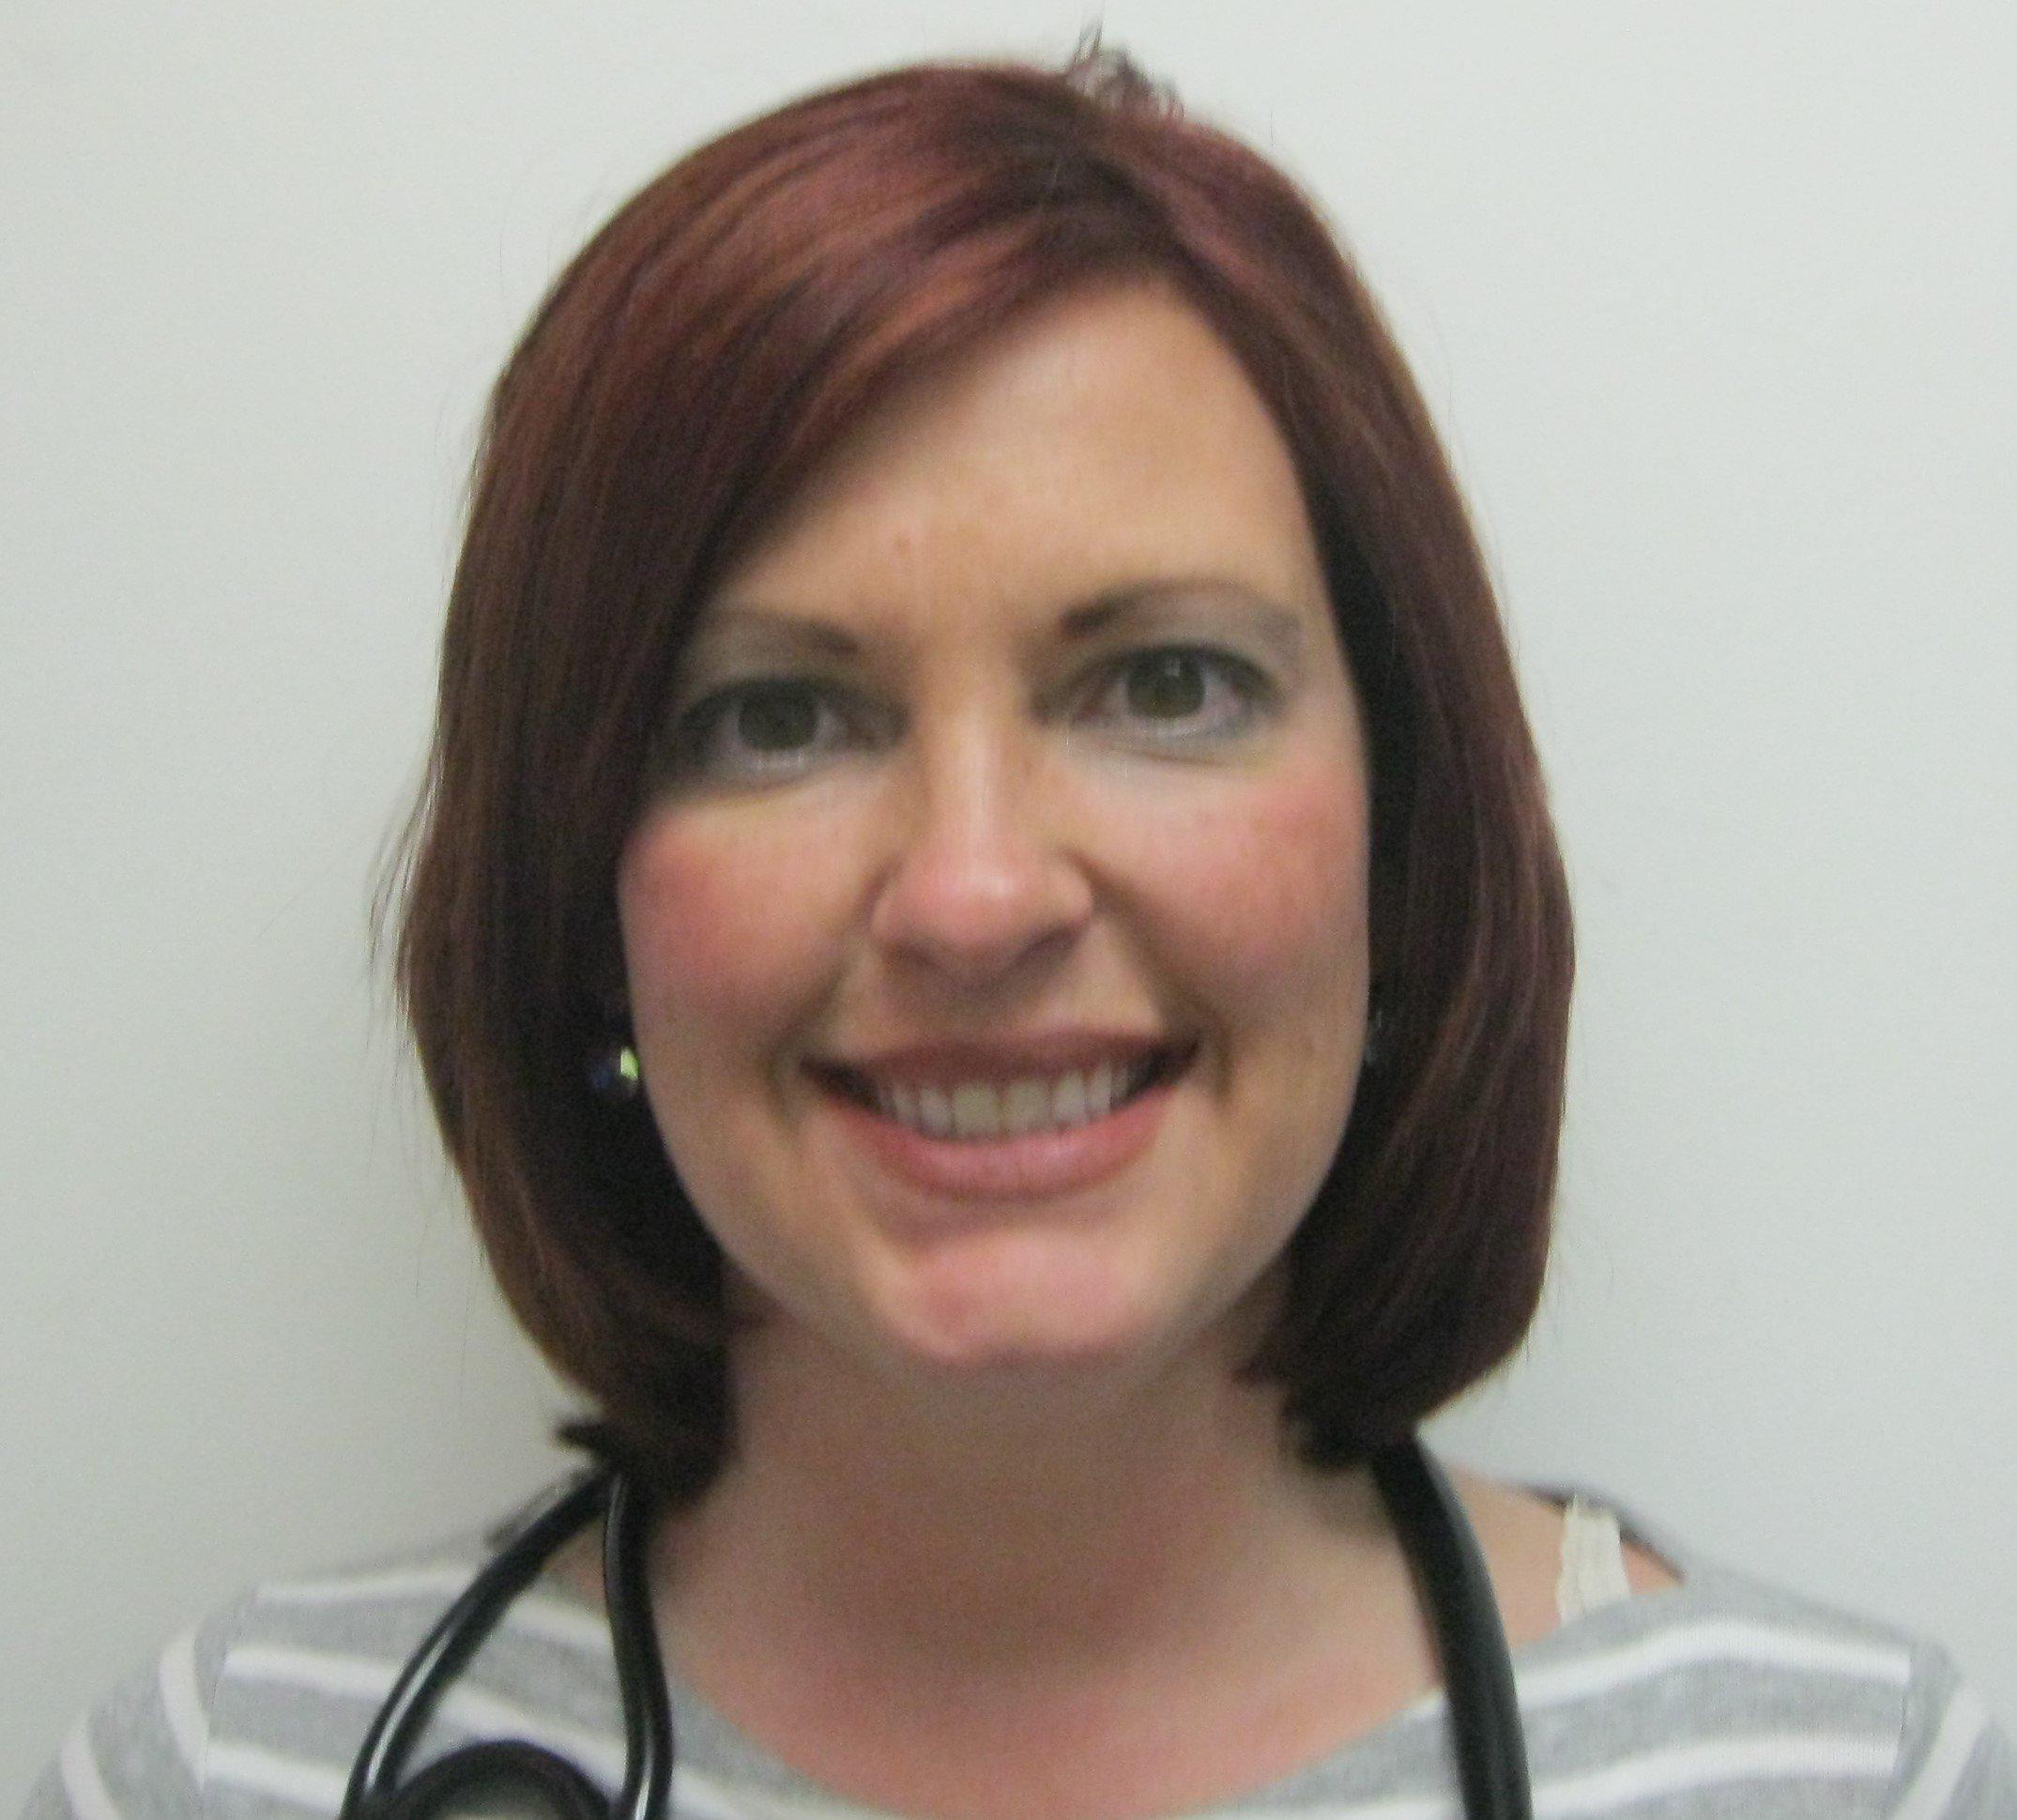 hair loss treatment McKinney